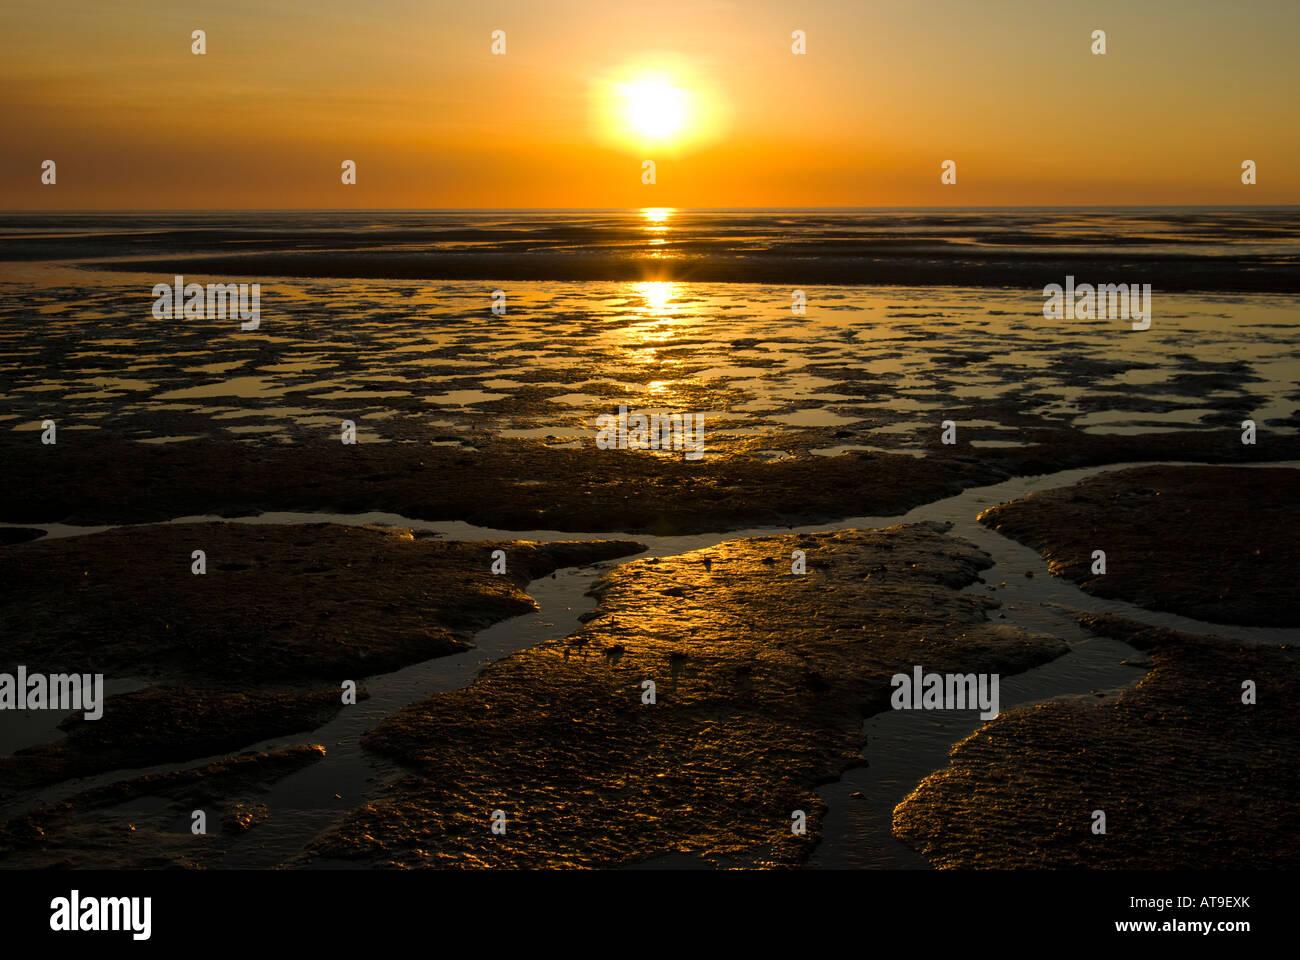 Sunset over the mudflats in Kakadu - Stock Image